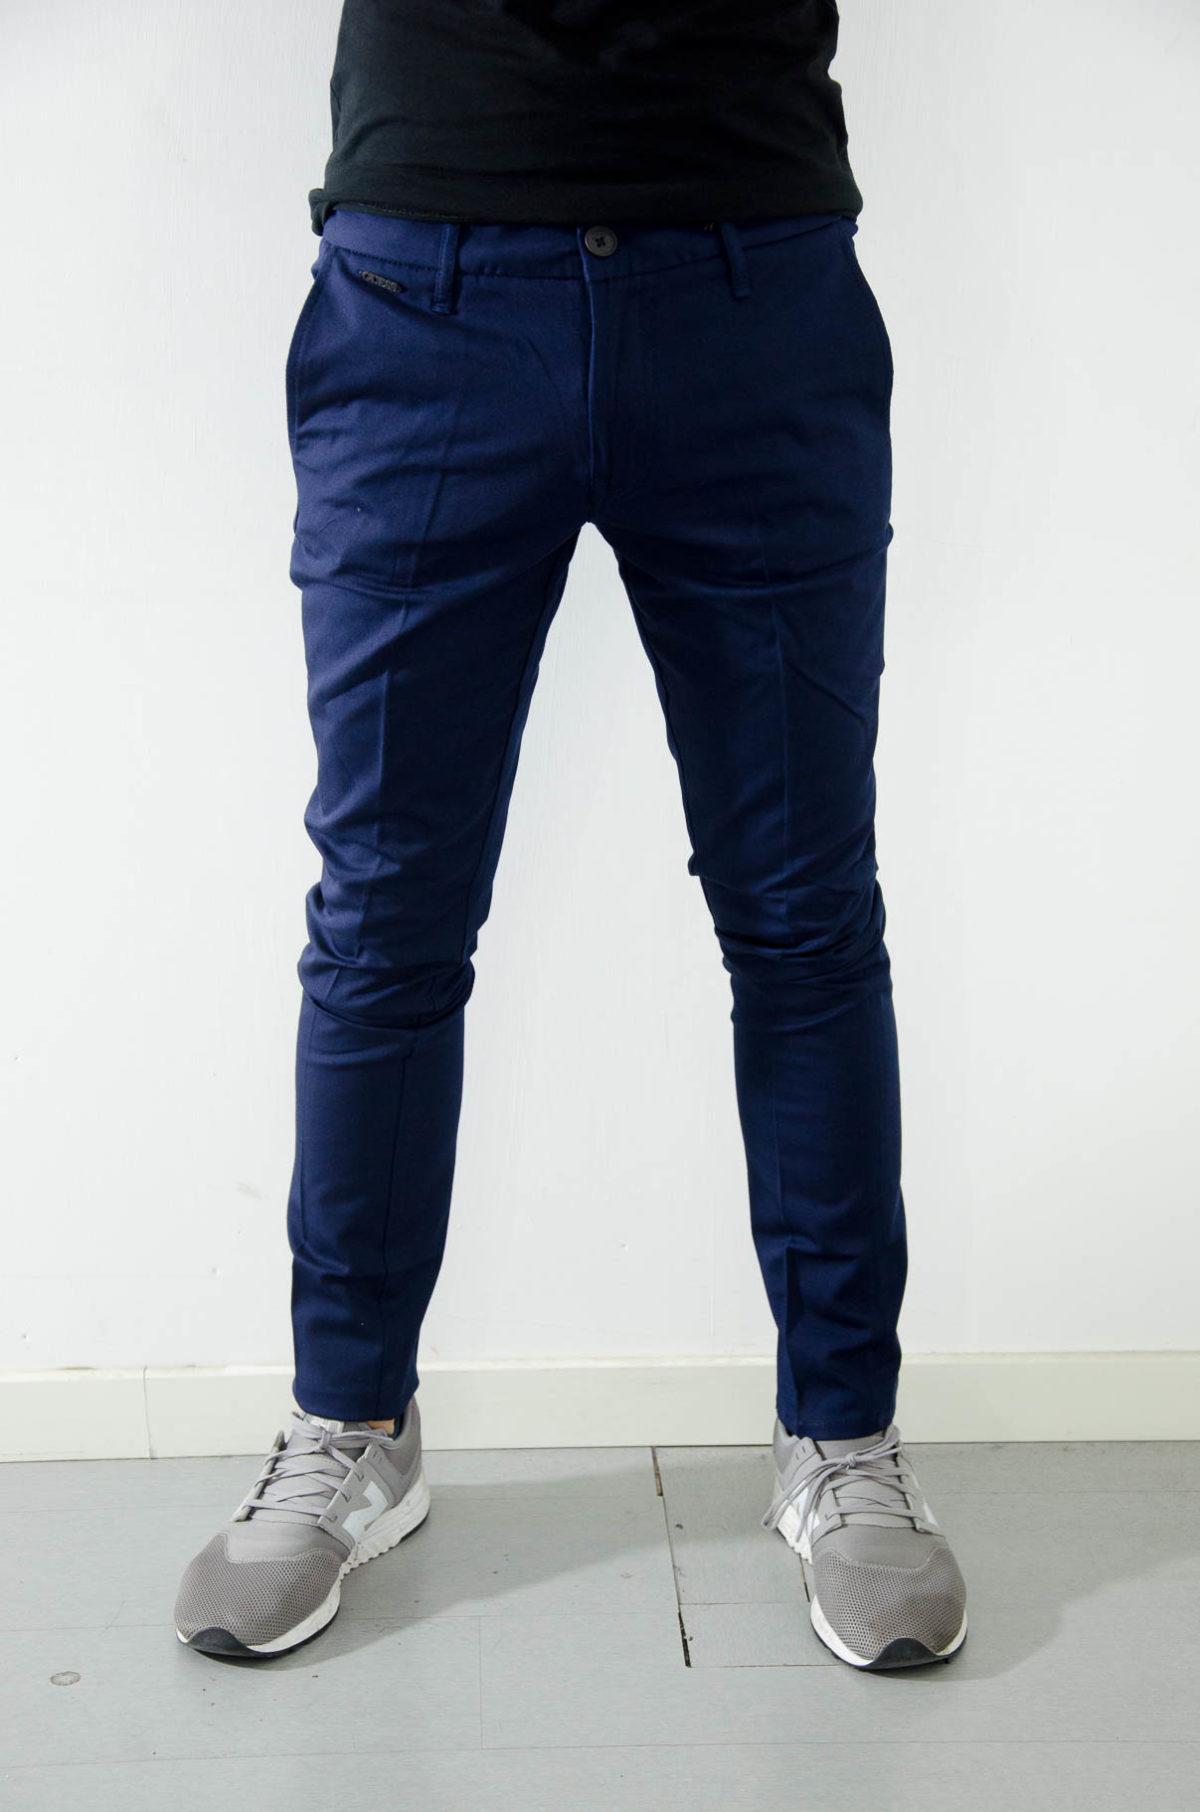 Guess Pantalone Uomo